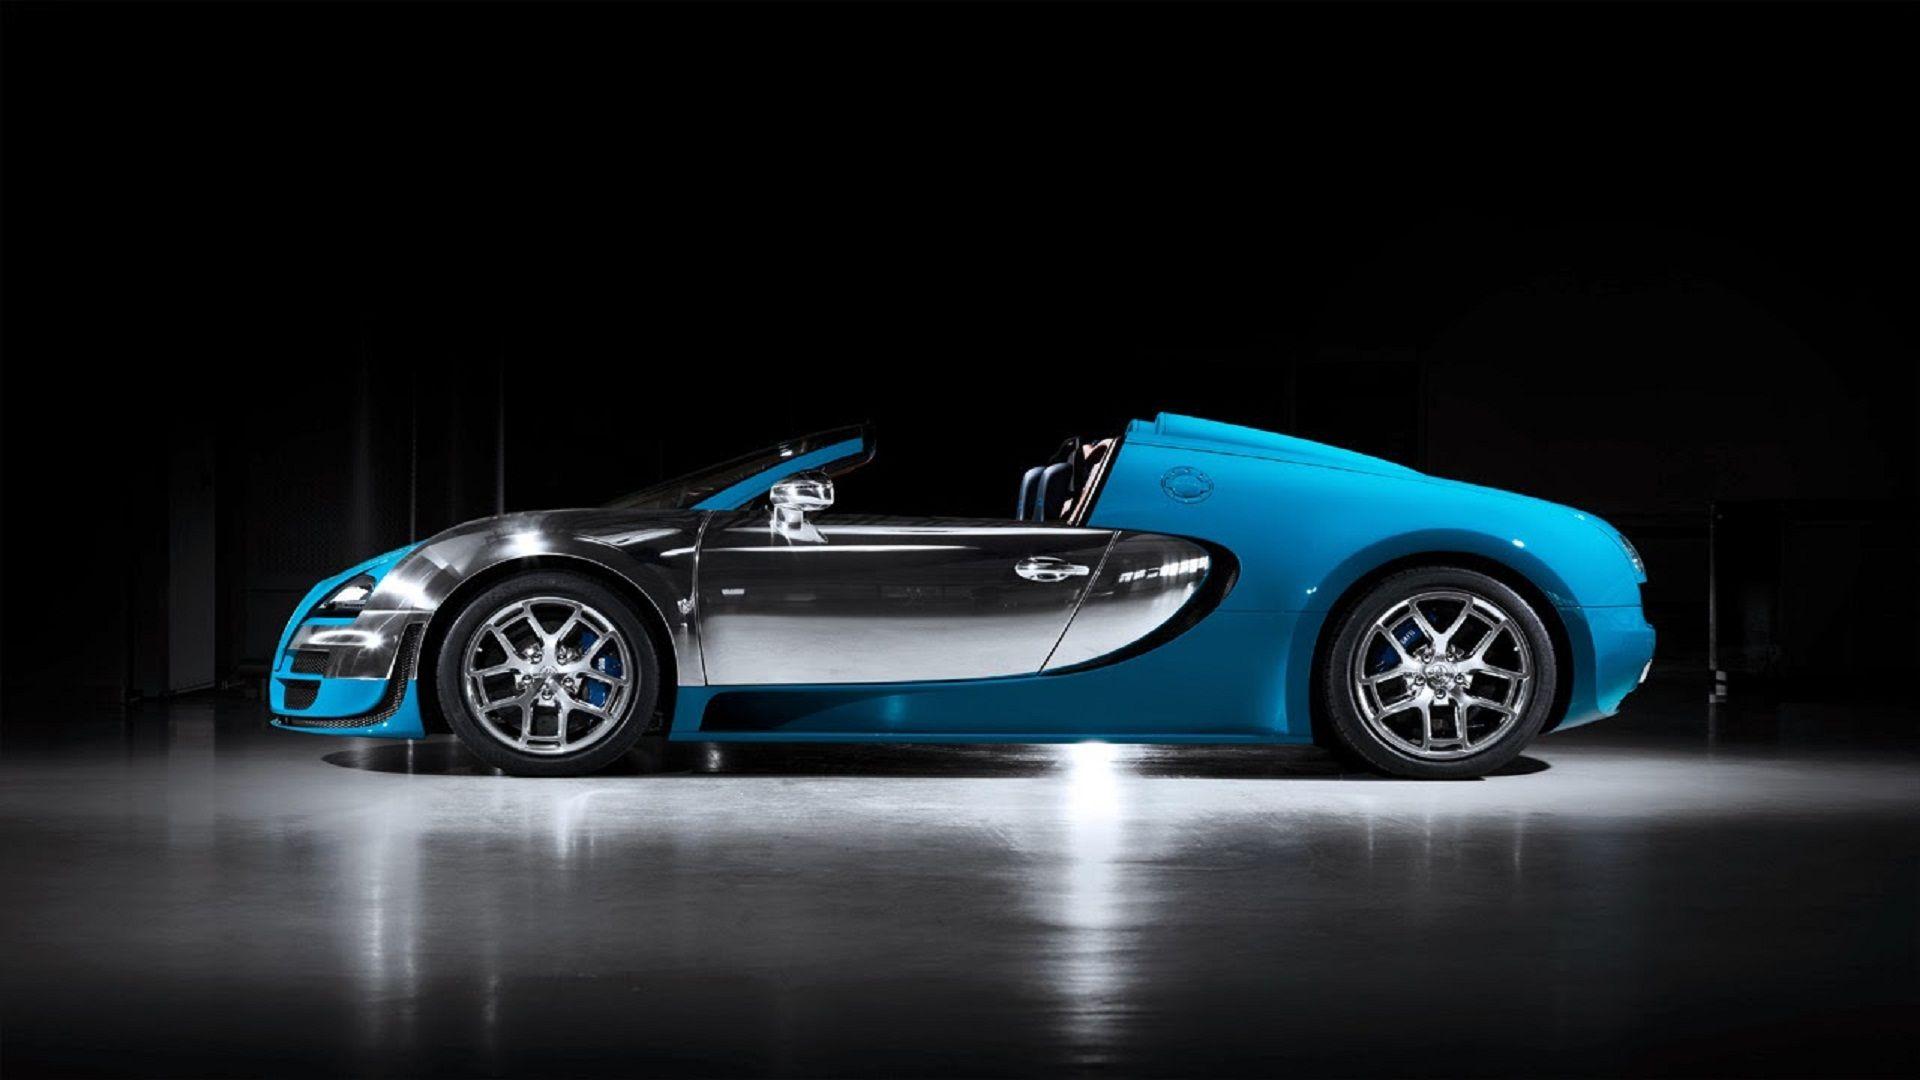 c33db69a07462972703c3baed1b25b92 Exciting Bugatti Veyron New Model 2015 Cars Trend